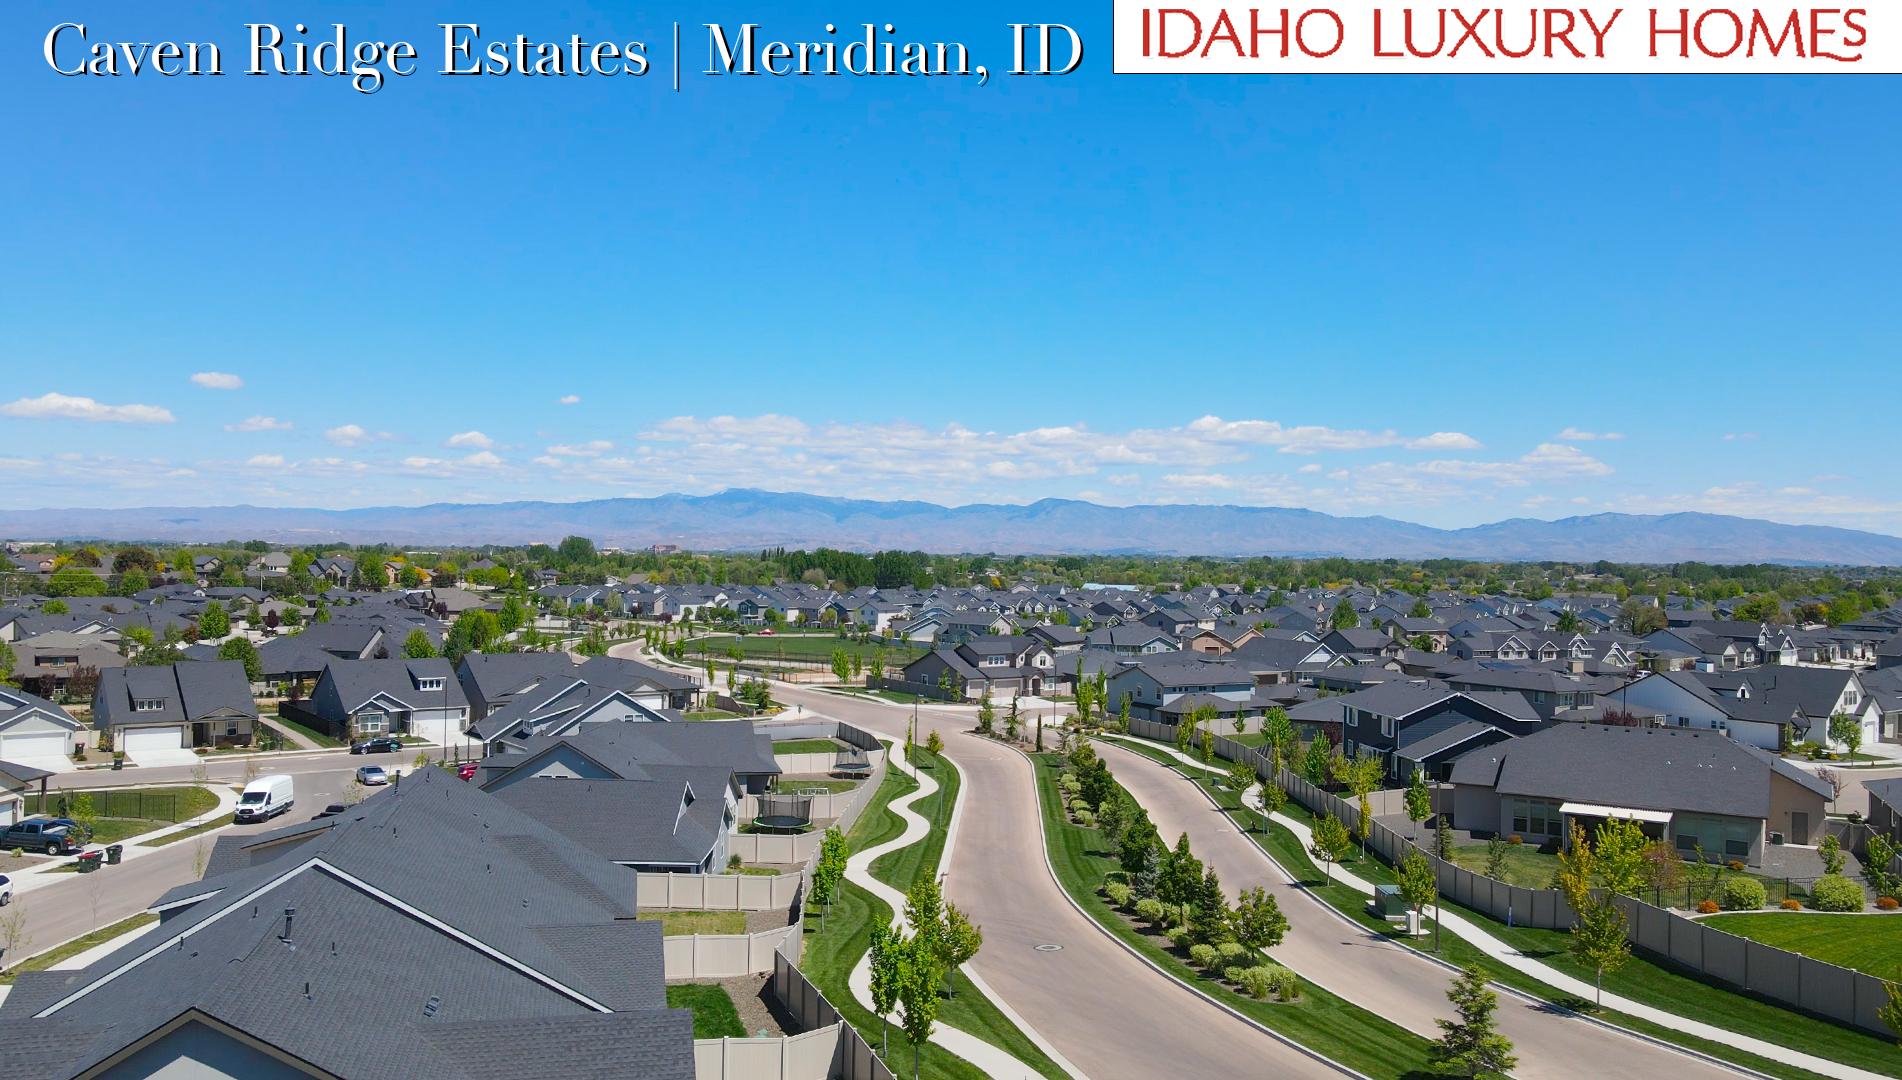 Caven Ridge Estates Real Estate